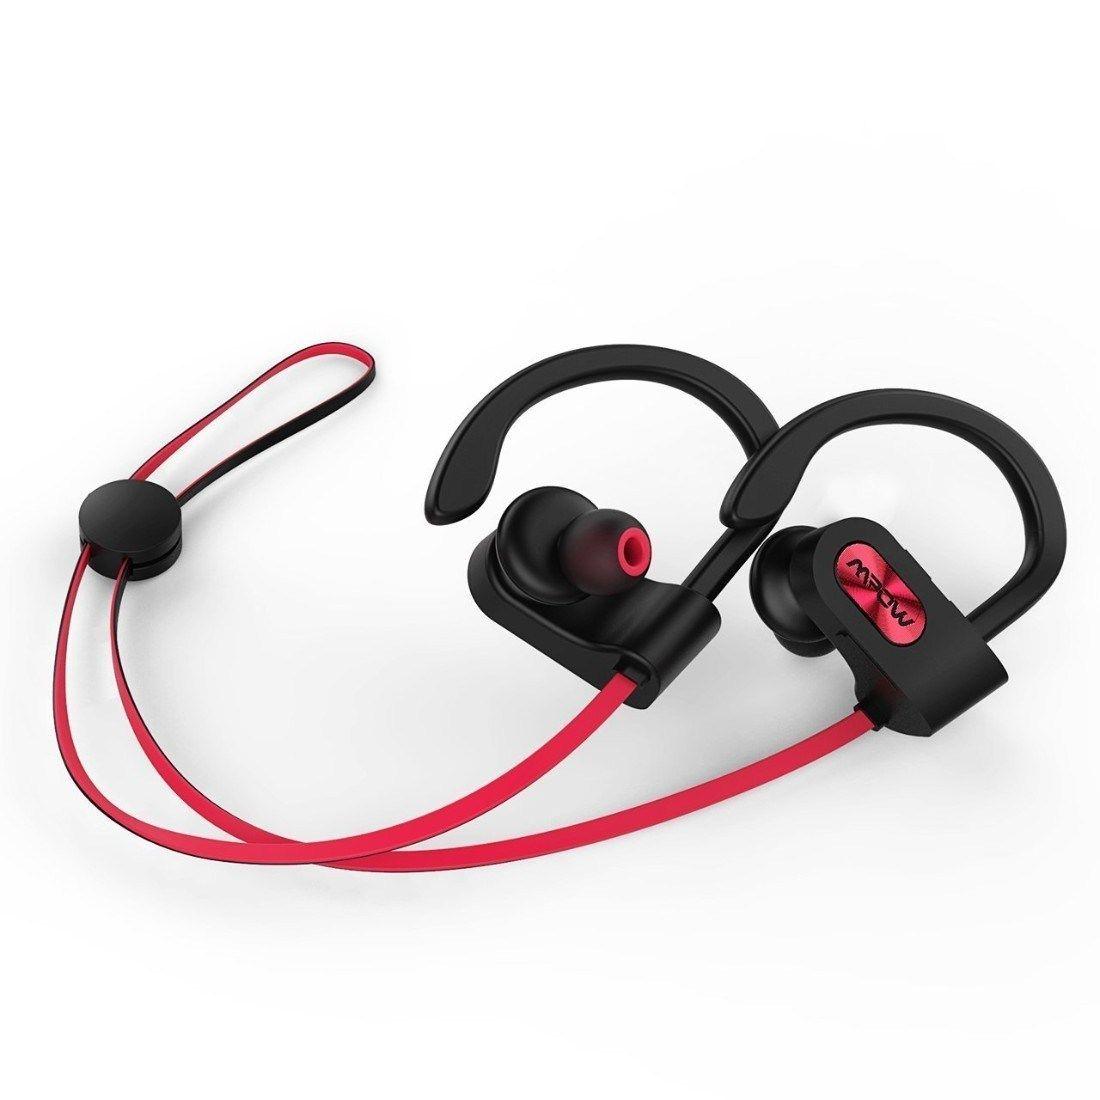 الصفحة غير متاحه Sport Earbuds Bluetooth Headphones Waterproof Earbuds